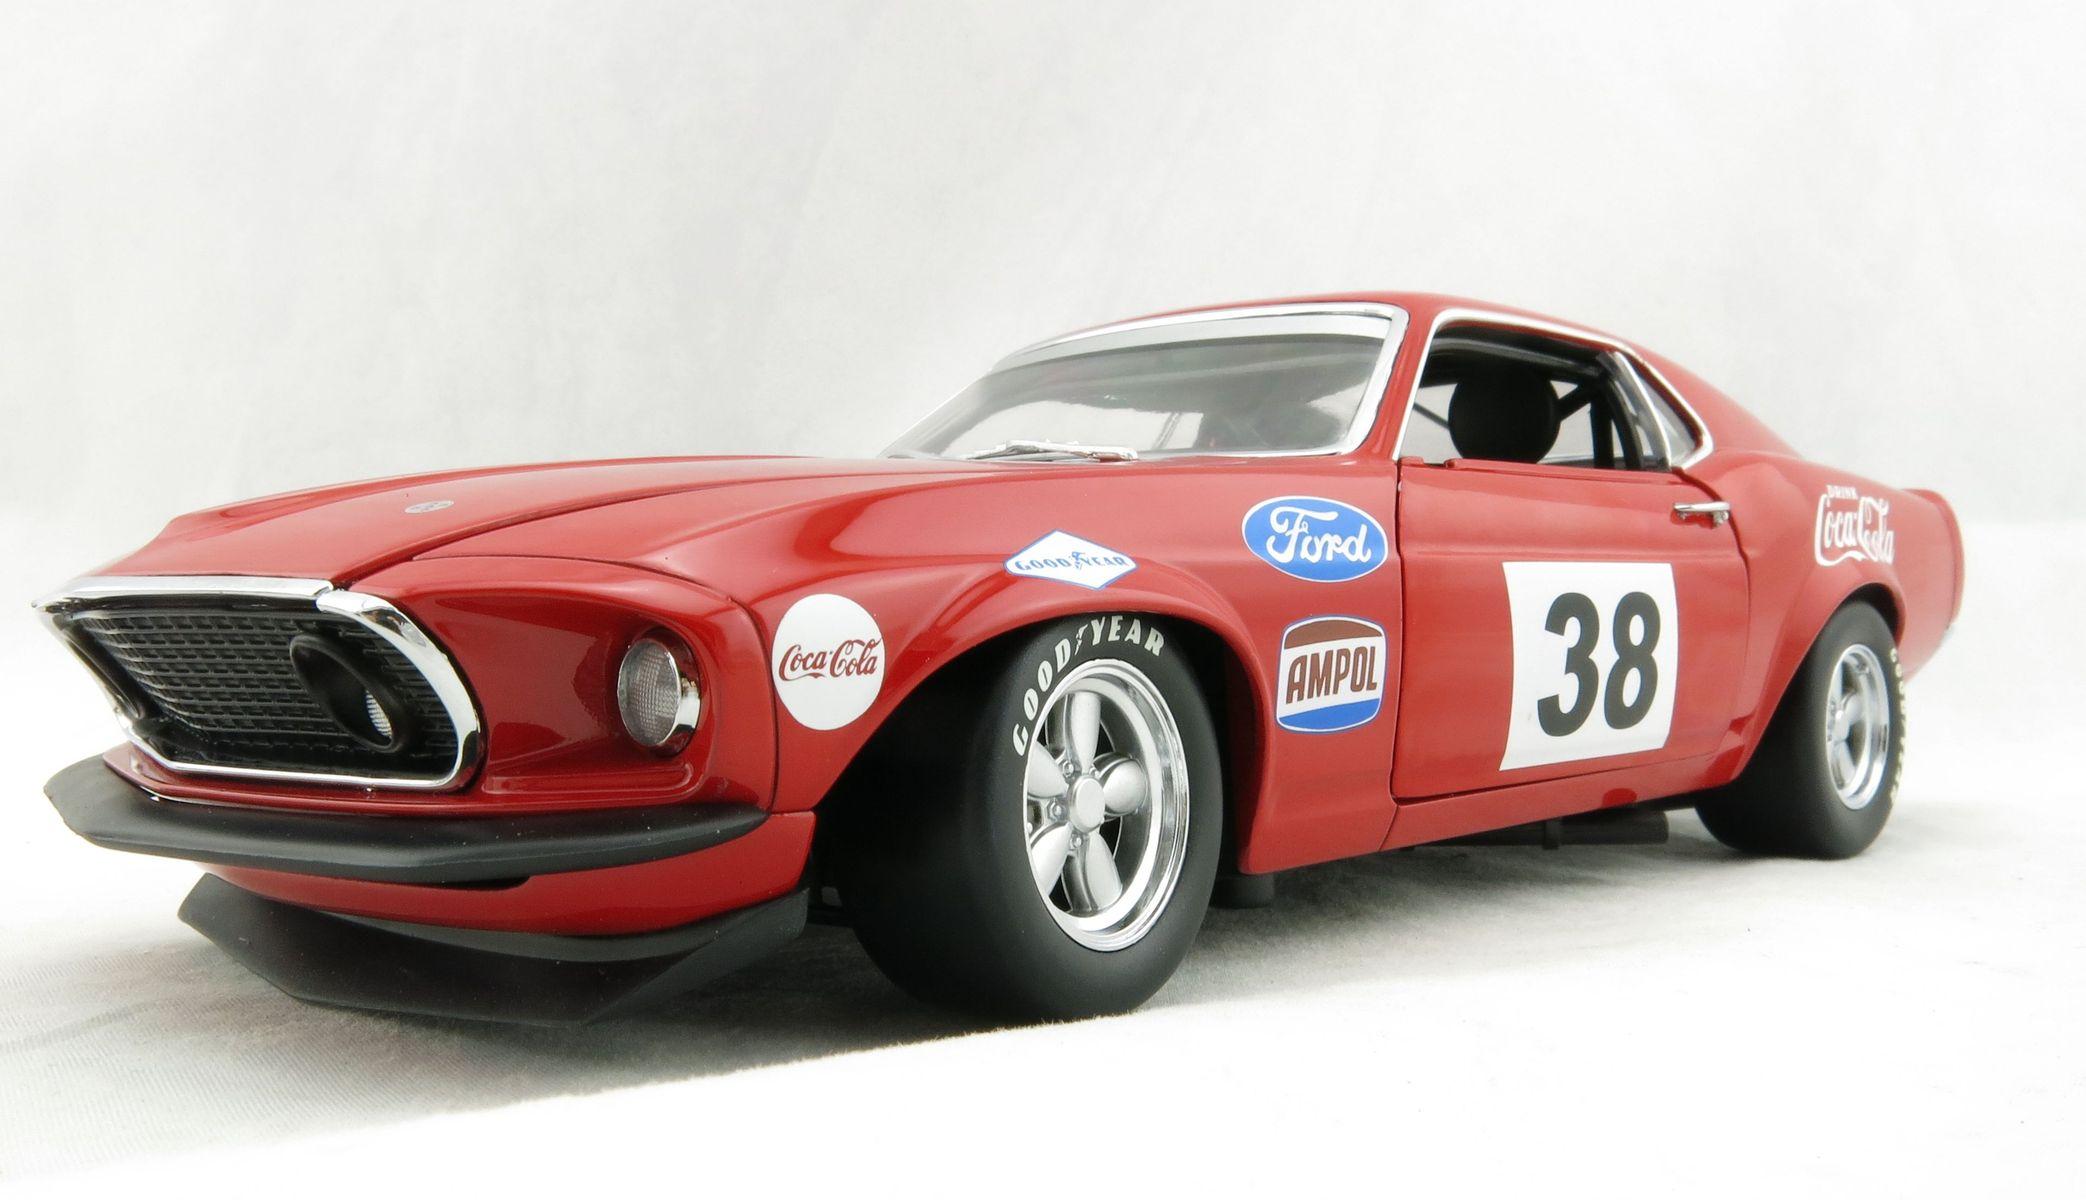 Details about dda acme 1969 ford boss 302 trans am mustang alan moffat racing coca cola 118